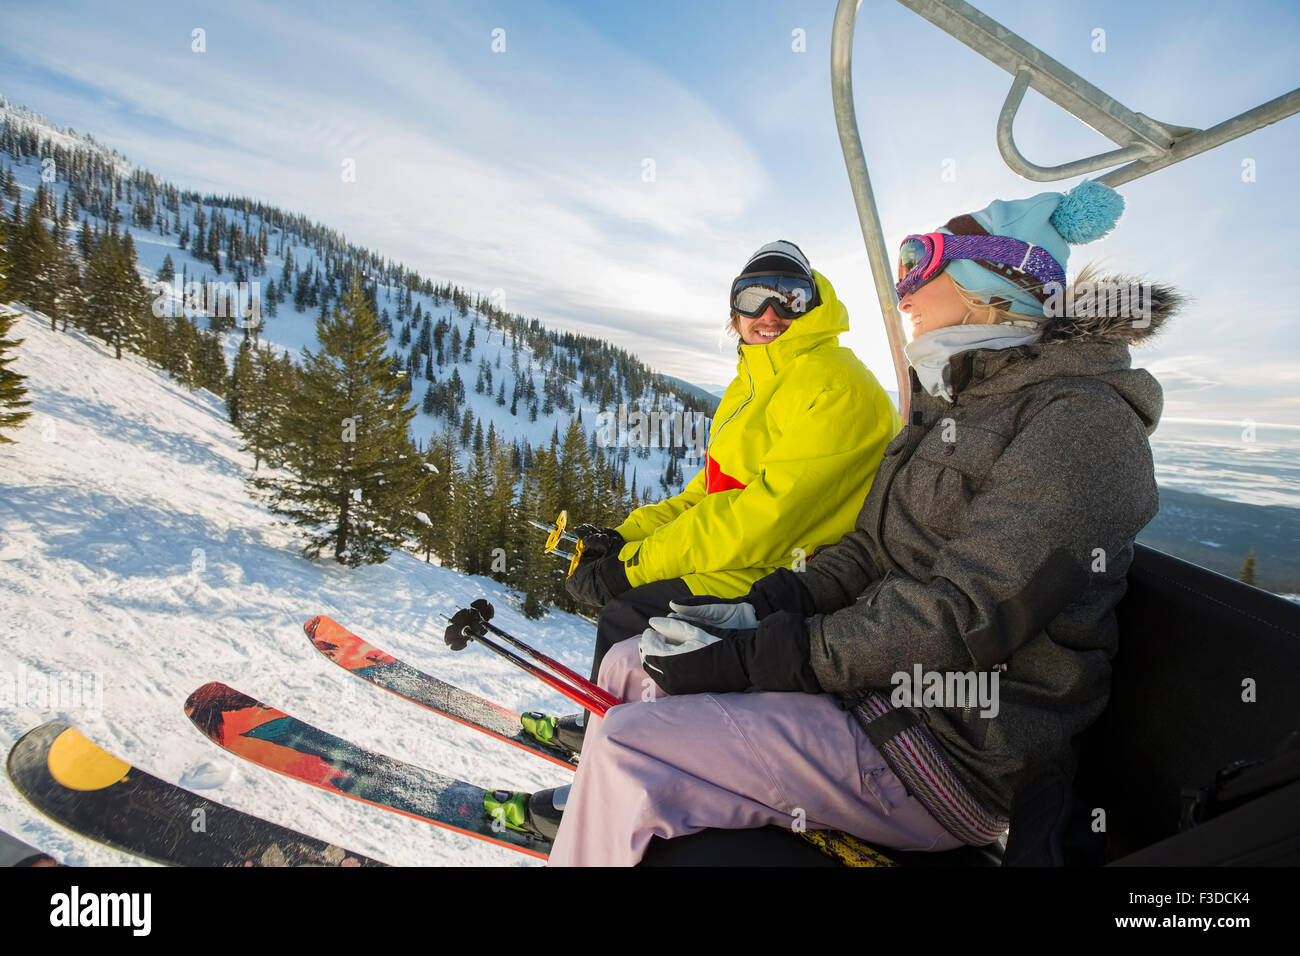 Paar in Skibekleidung sitzen am Skilift Stockfoto